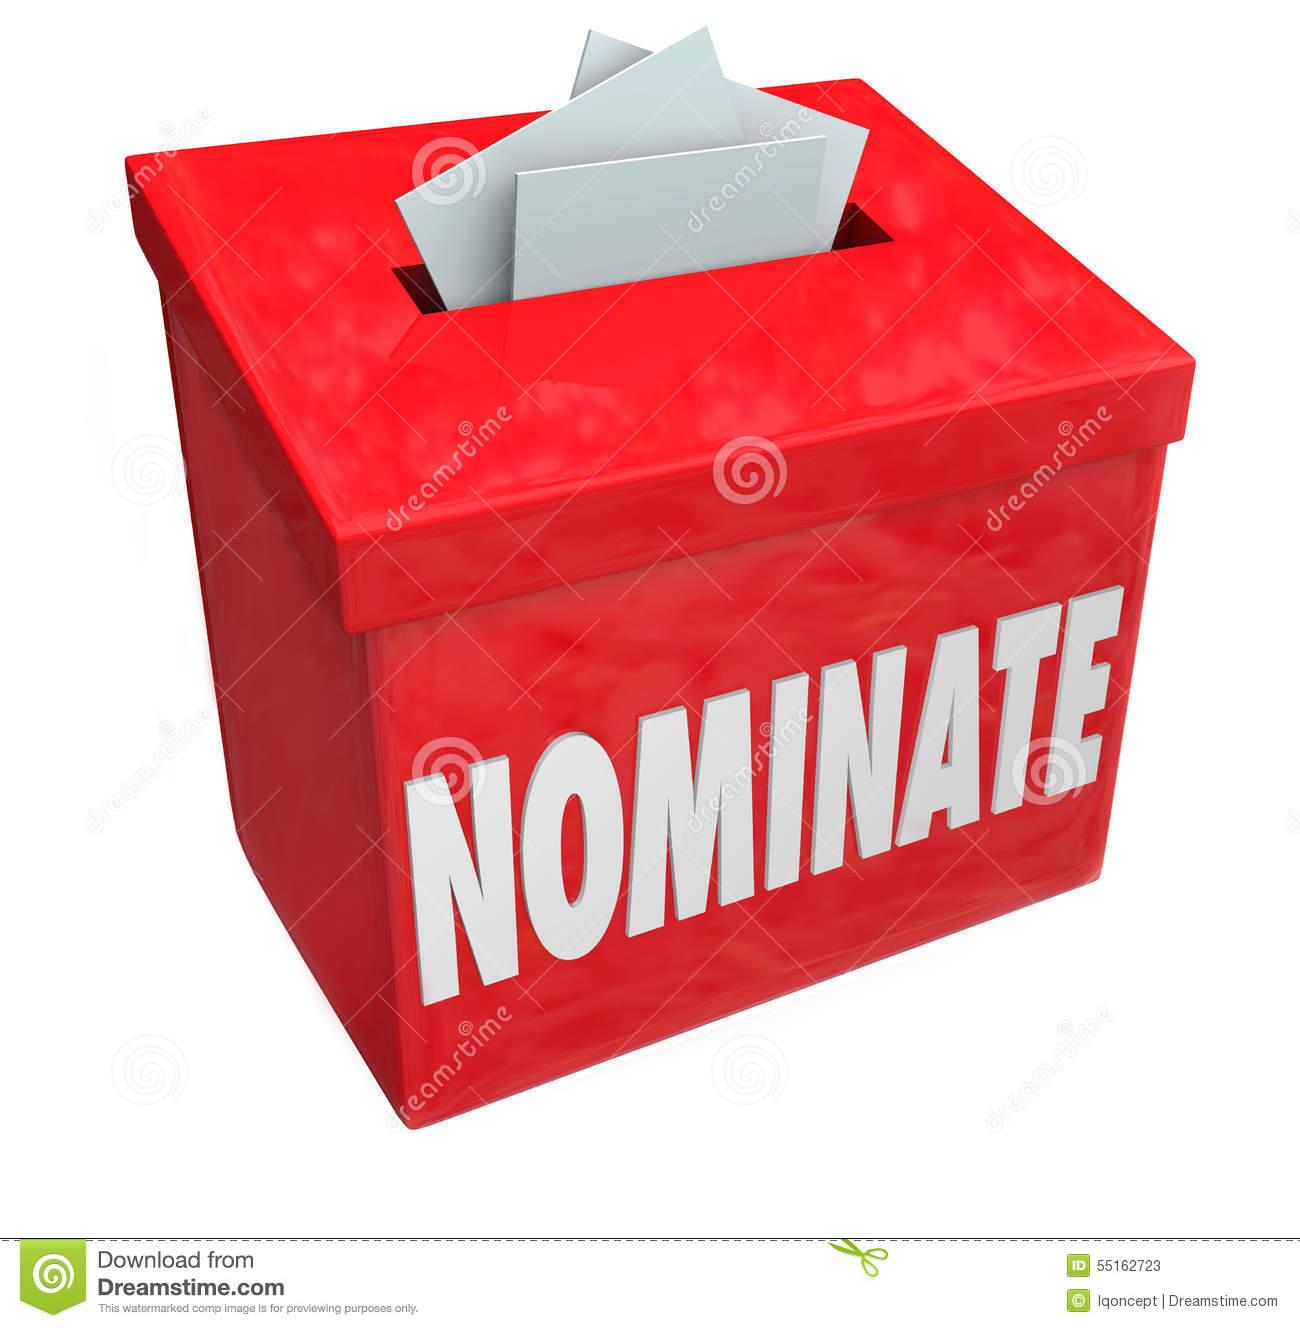 Panels clipart nomination Art Clip Nomination Panda Free